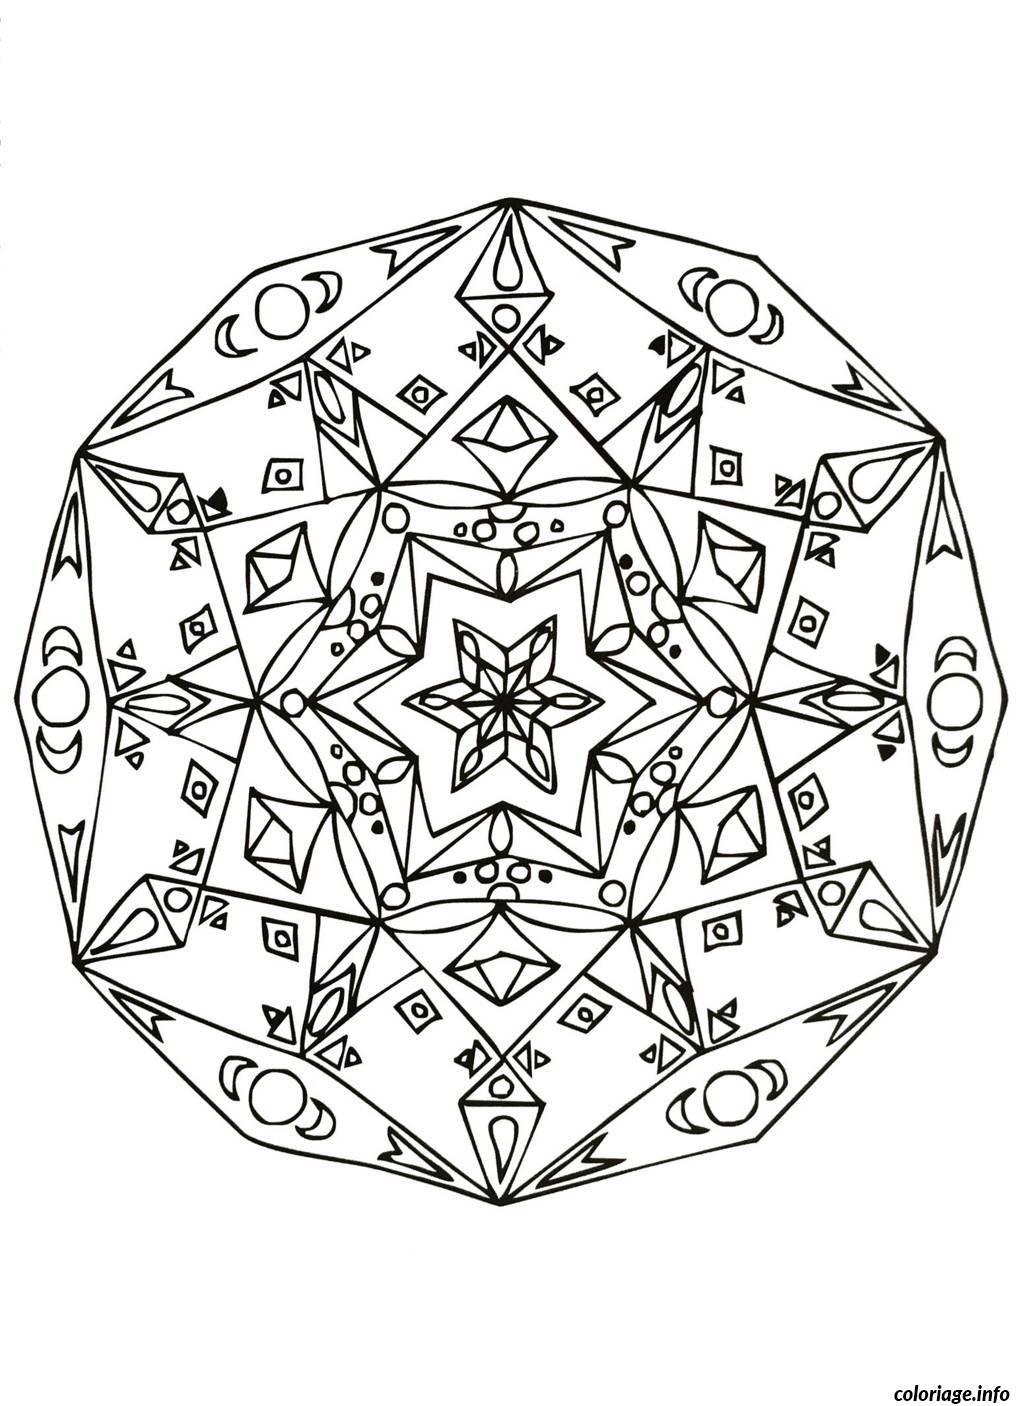 Coloriage mandalas to download for free 16 dessin - Dessin geometrique a colorier ...